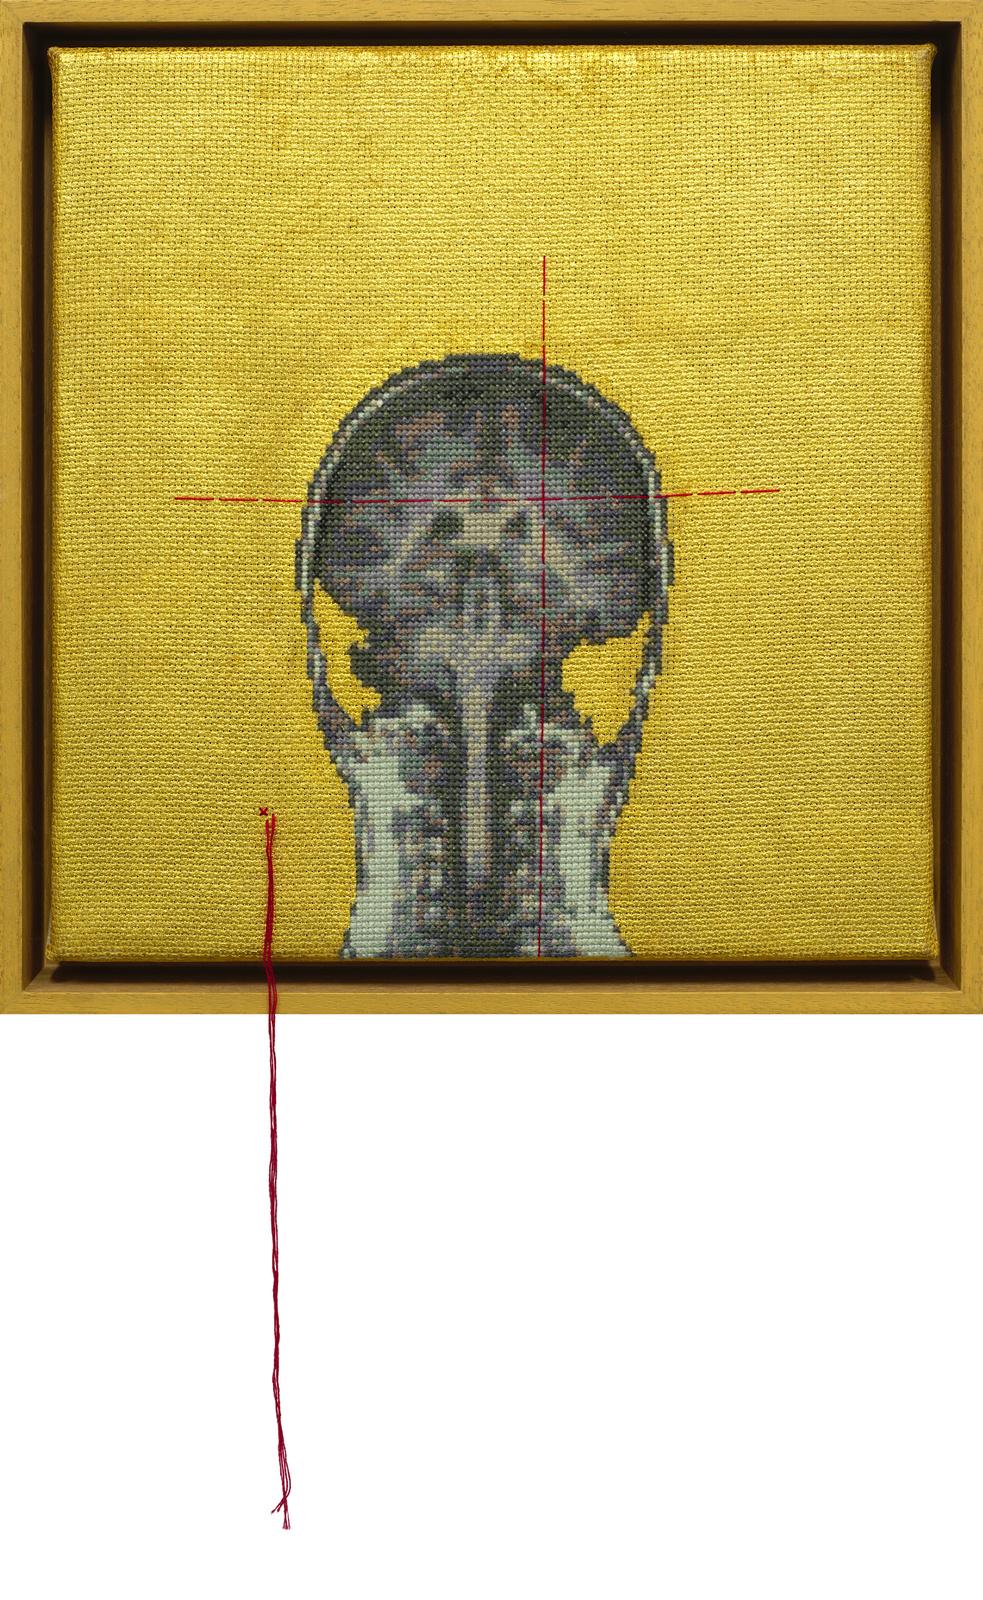 Lada Dedic Self Portrait; Artist's Brain Stranded cotton, 23 karat gold on aida cloth, 2017 300 x 290 mm  Stitching time: 43 hours 55 minutes    photo Bob Newman